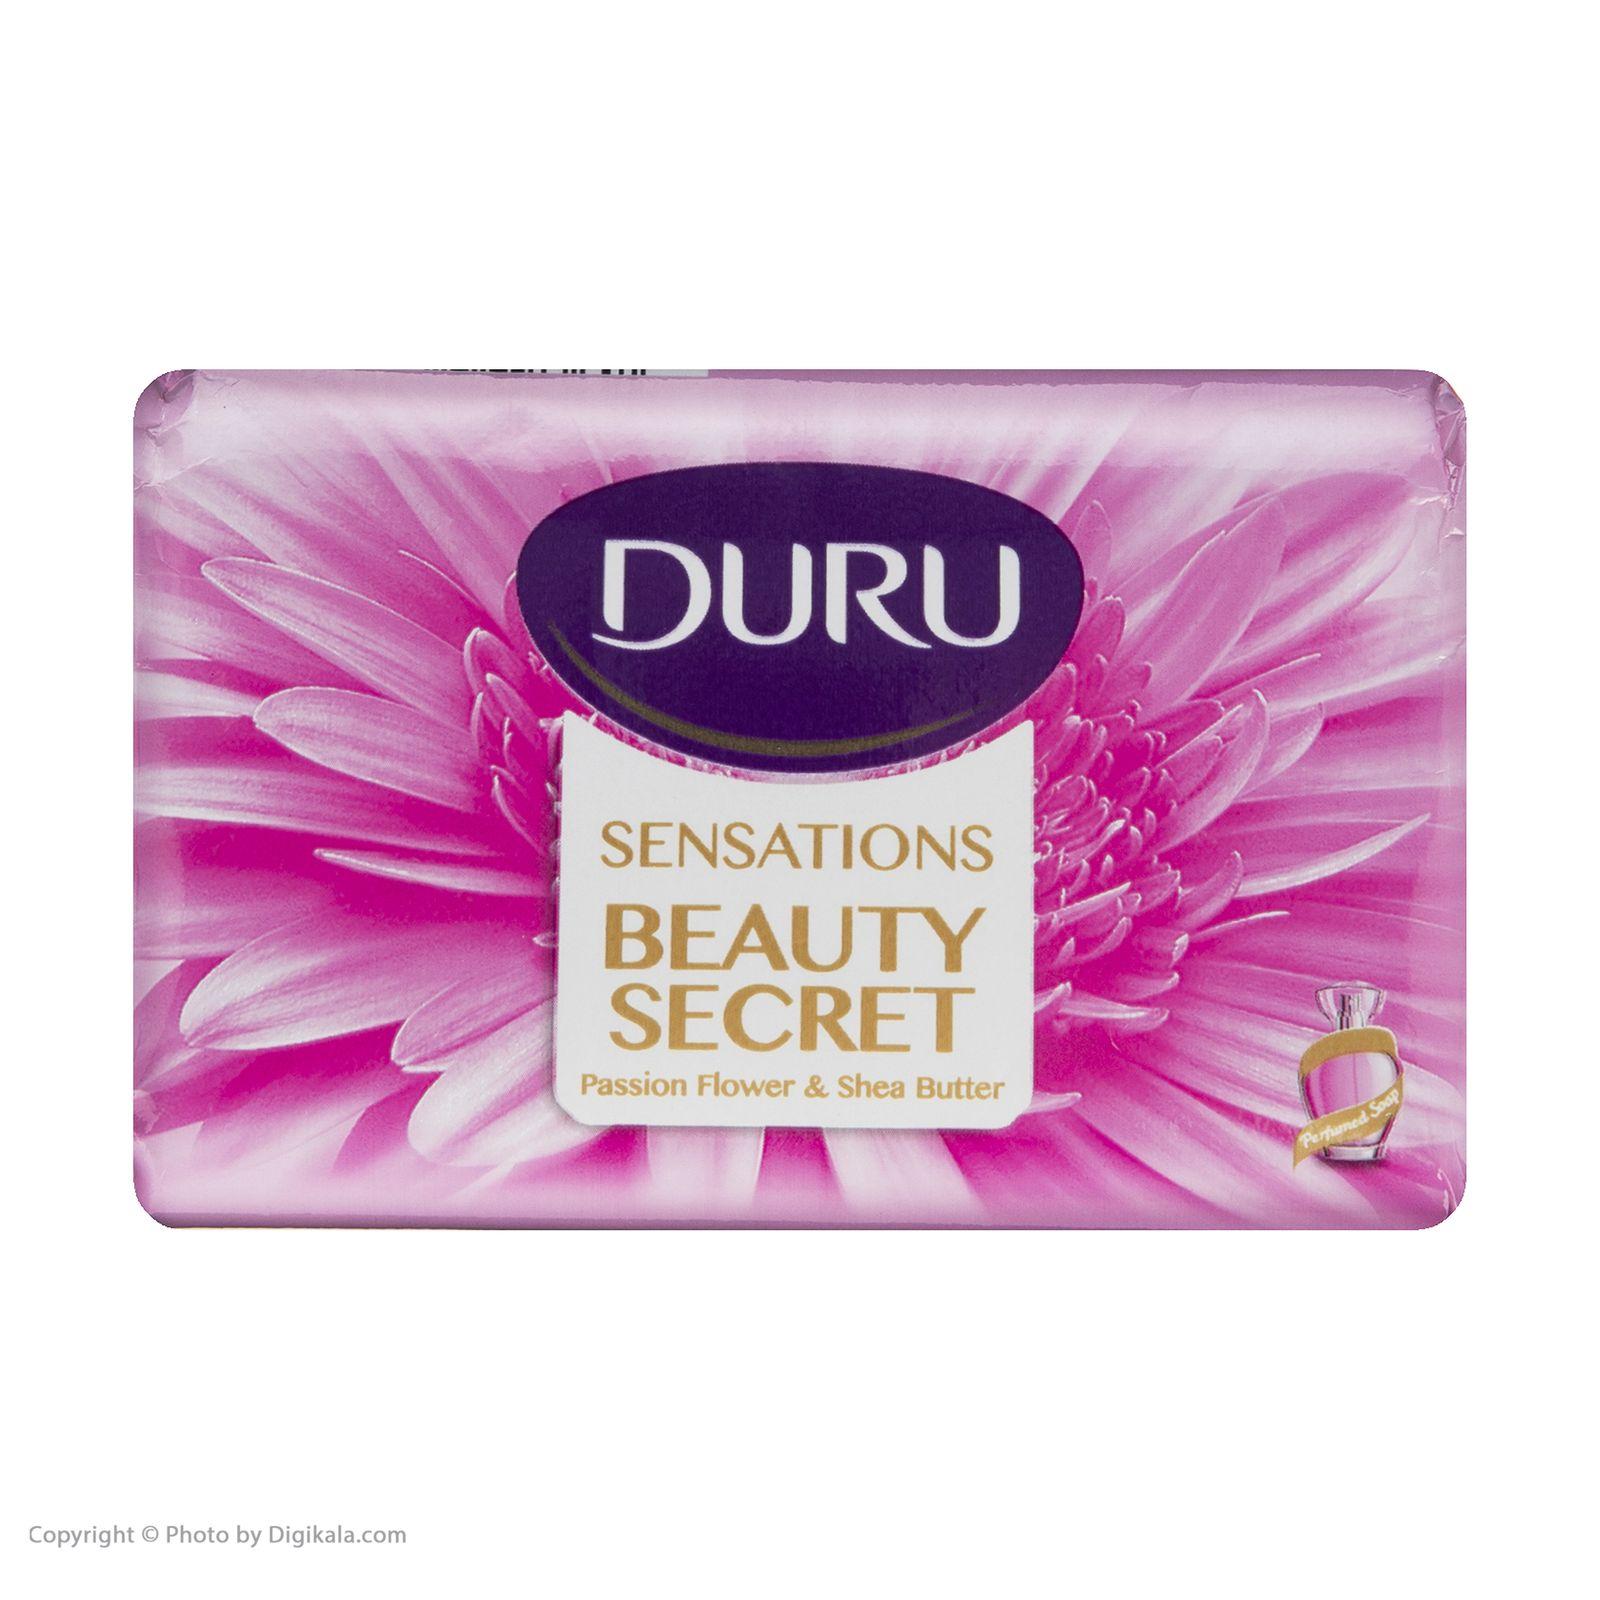 صابون دورو مدل Beauty Secret مقدار 125 گرم  -  - 5